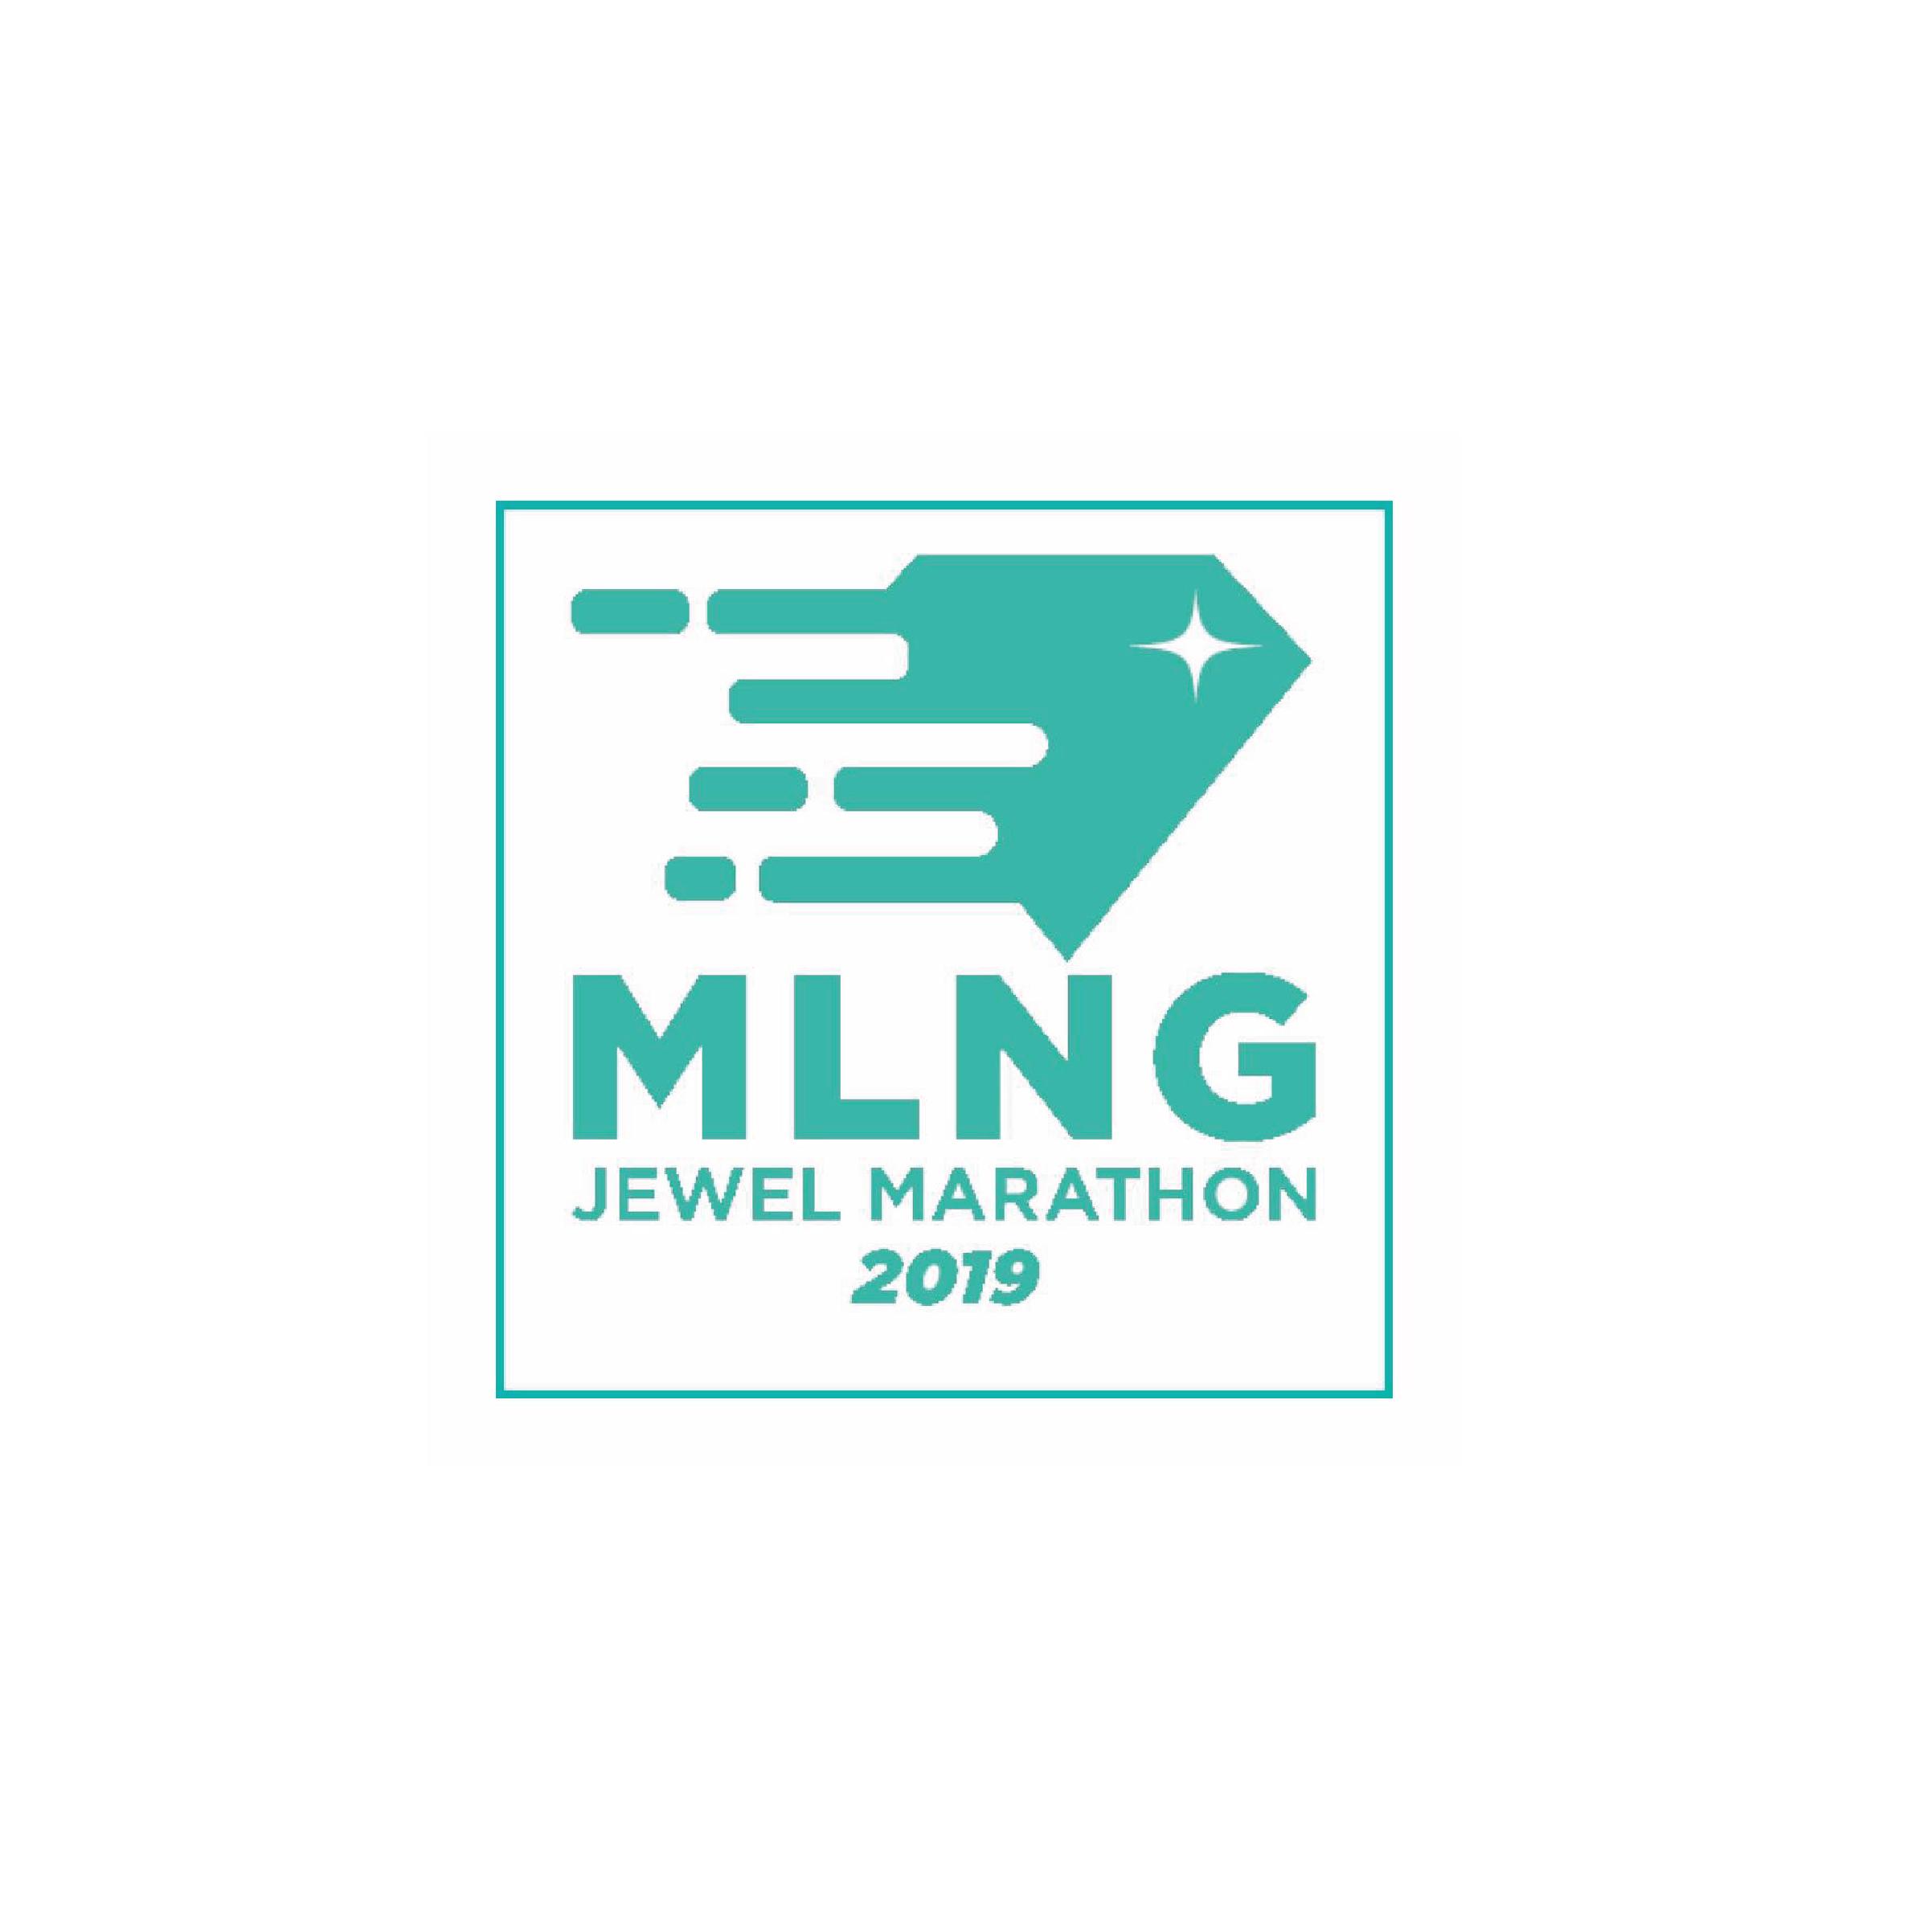 jewelmarathon-logo